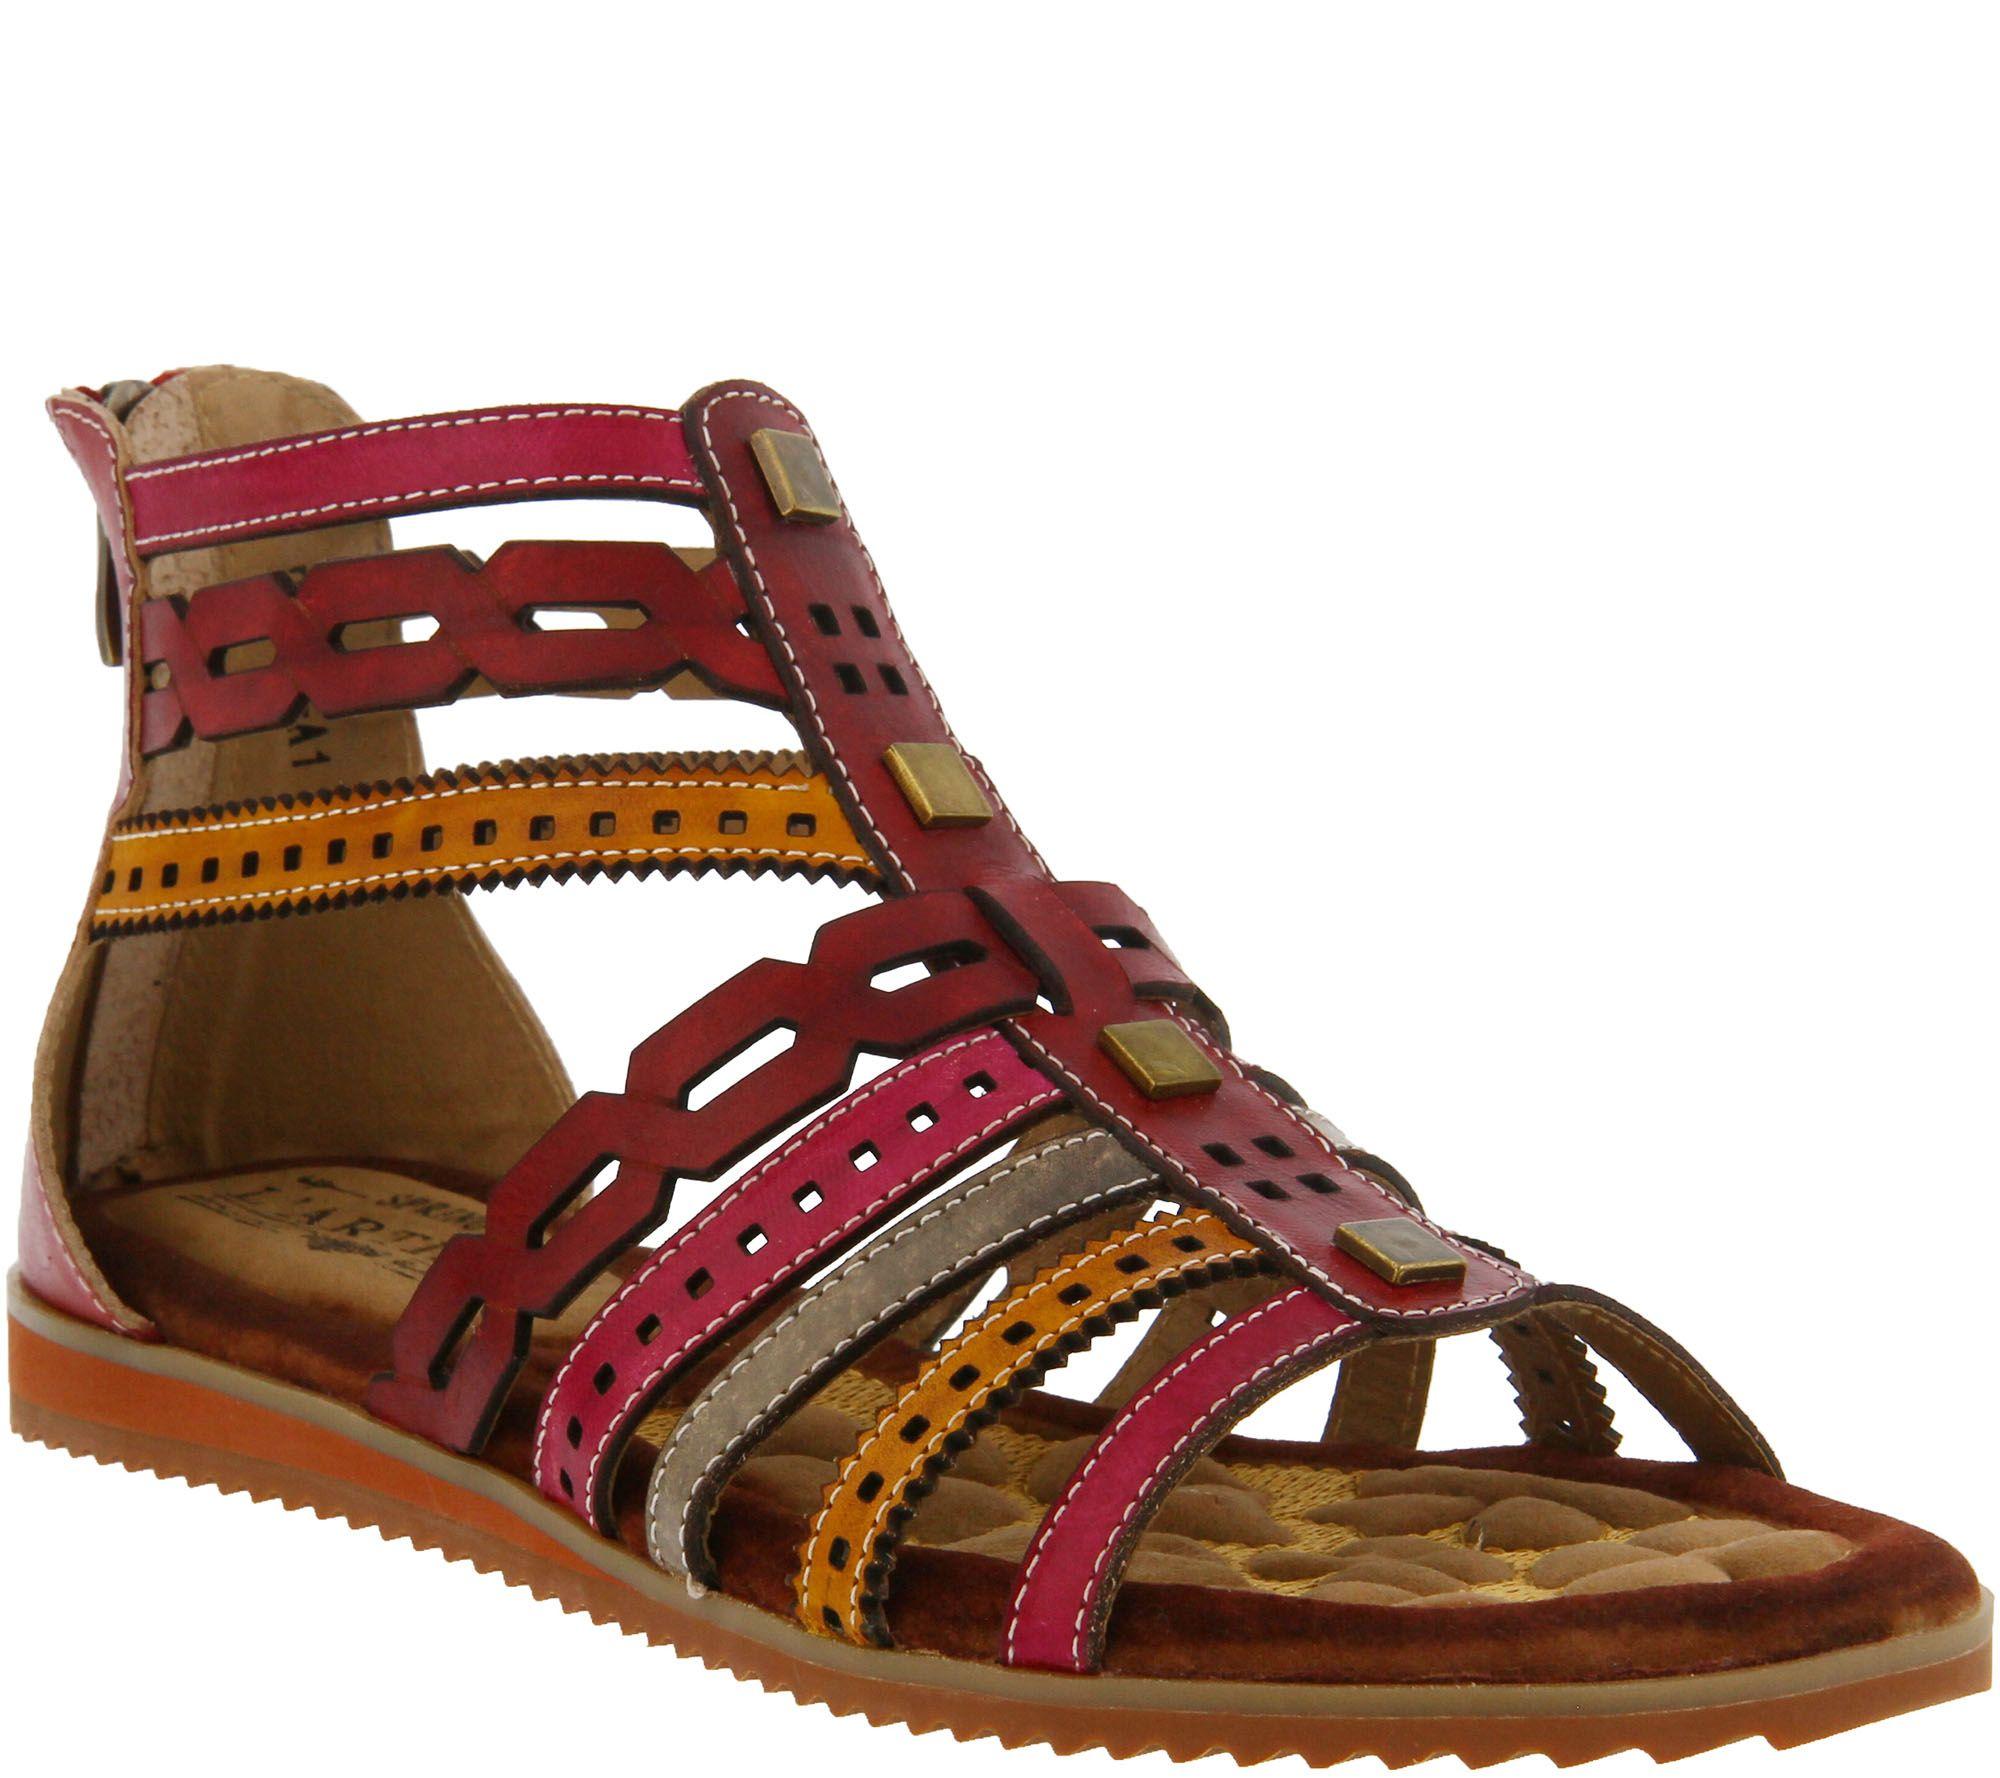 Womens sandals marshalls - Spring Step L Artiste Gladiator Sandals Anjula A357310